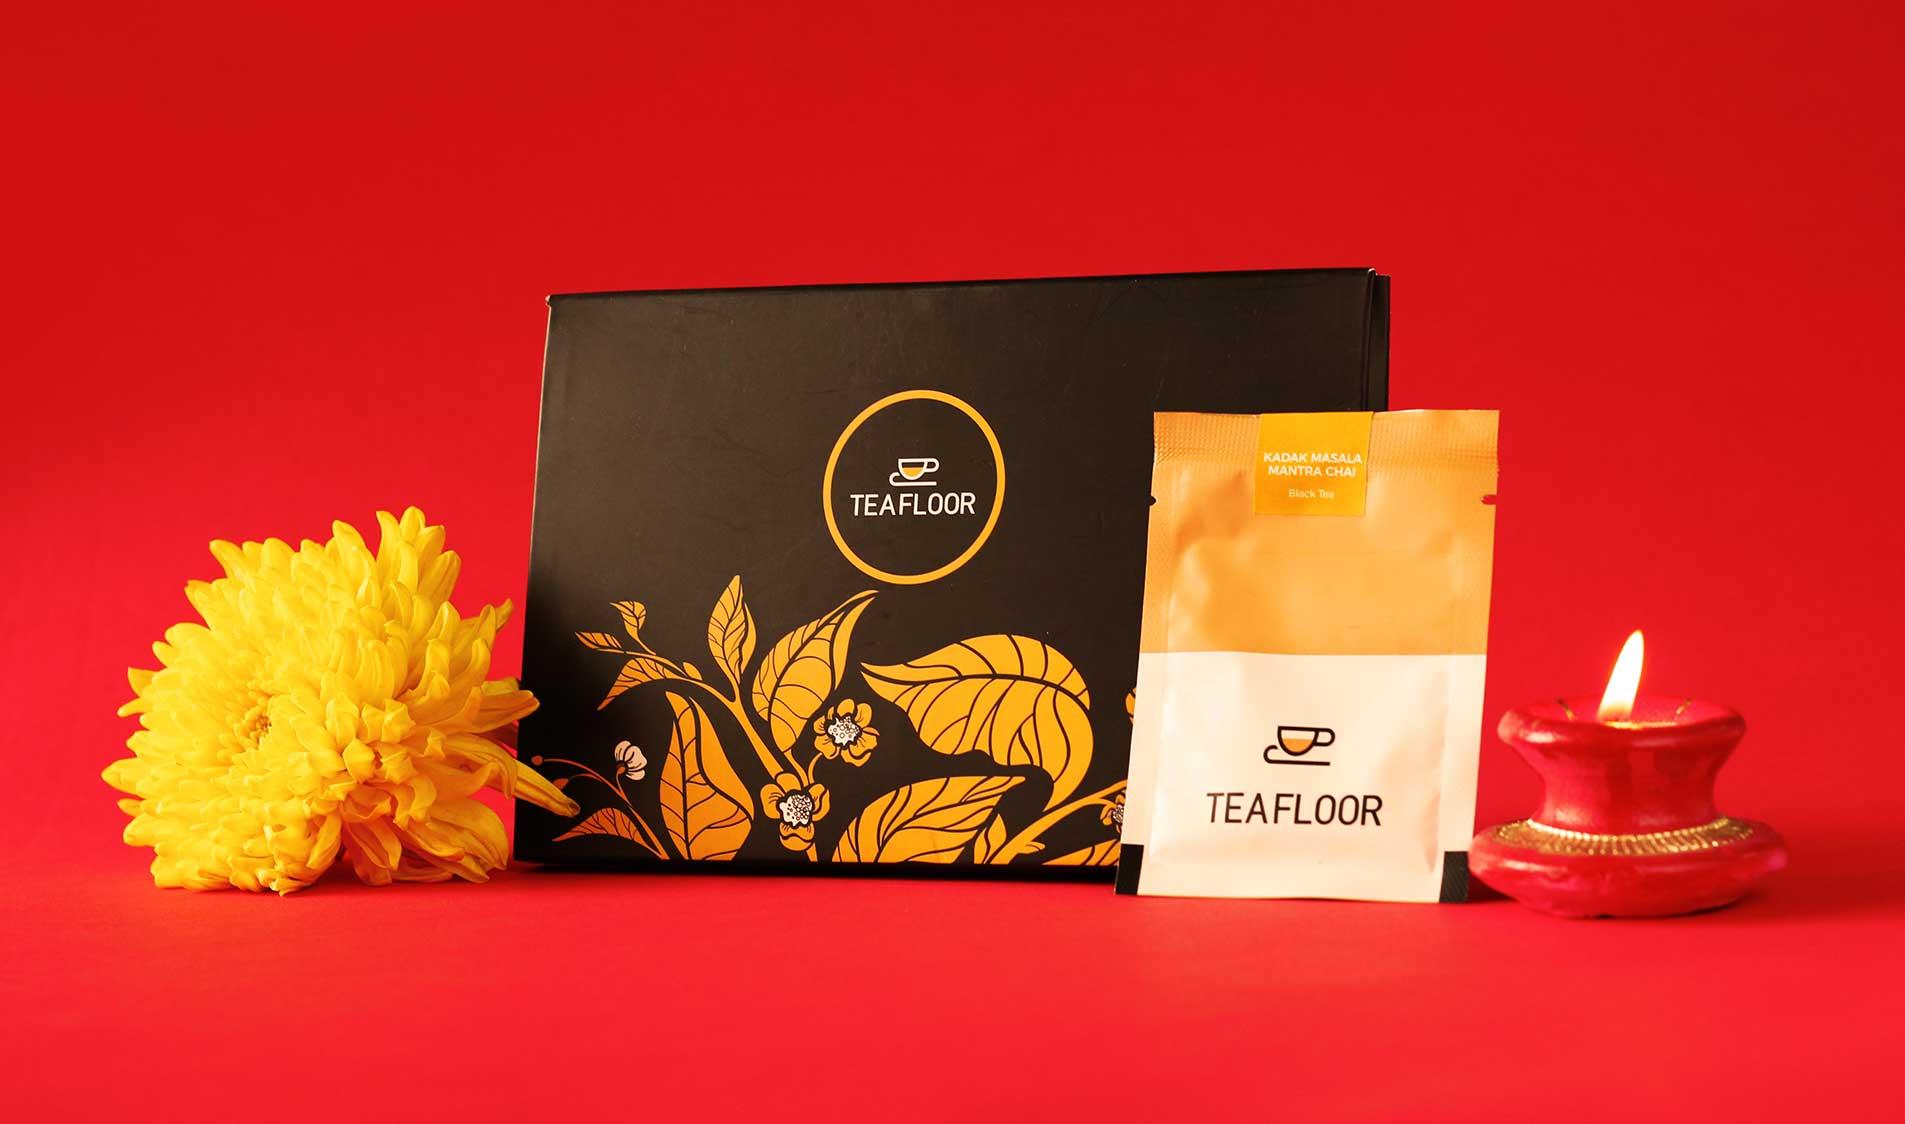 teafloor tea gift boxes